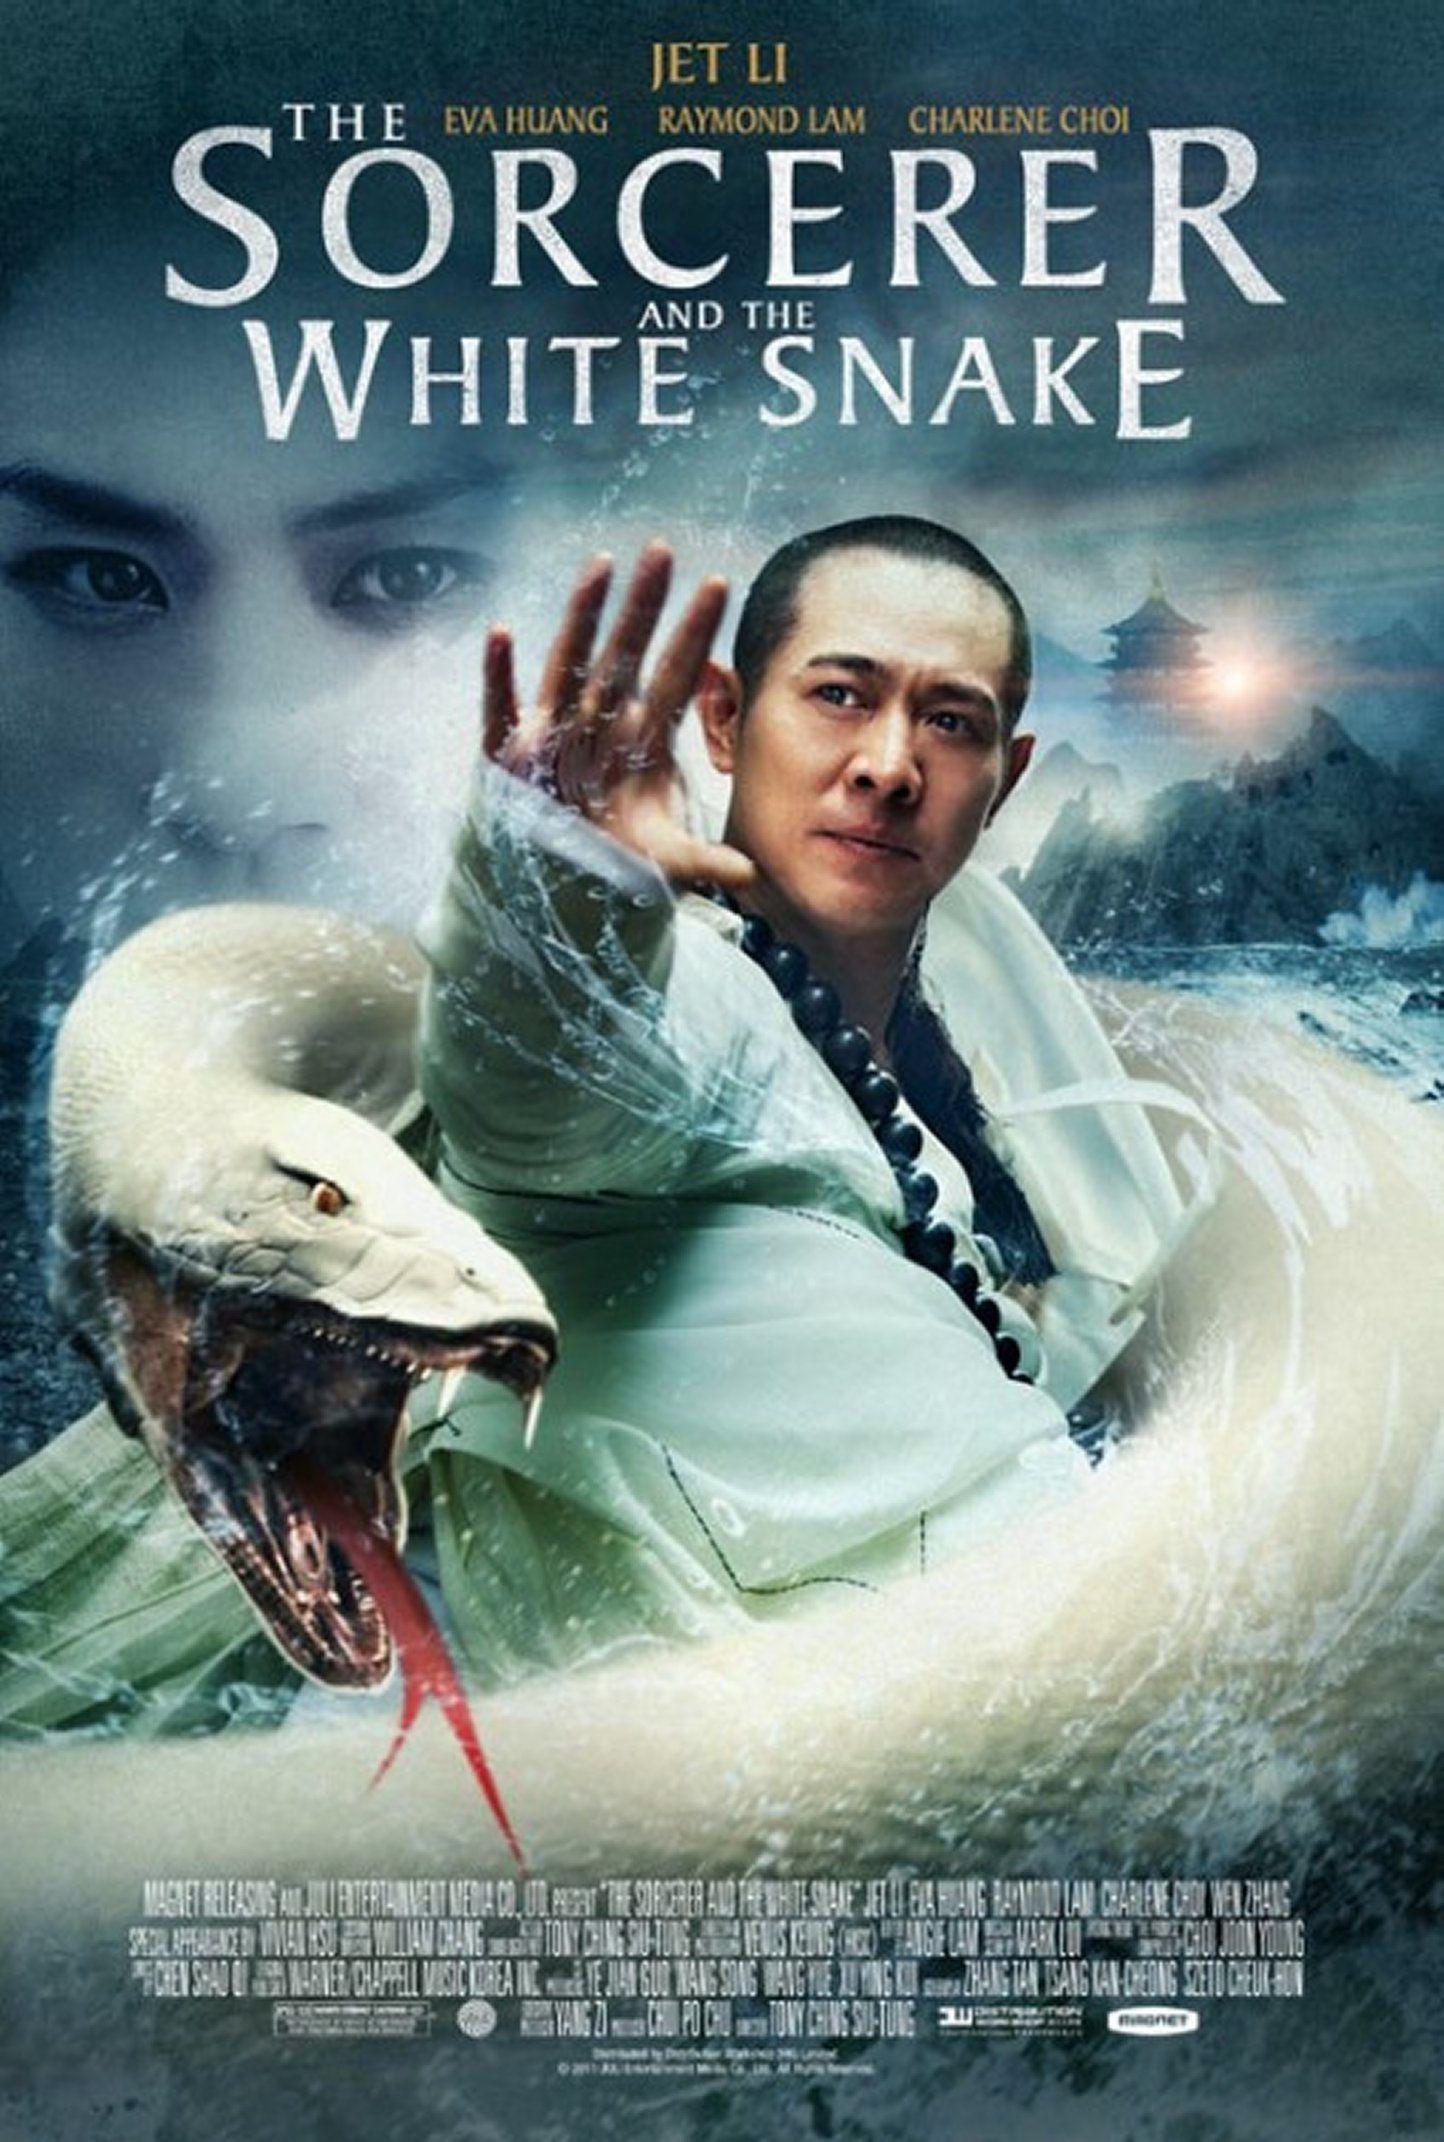 The Sorcerer And The White Snake 28 09 2011 Jet Li Sorcerer Fantasy Movies